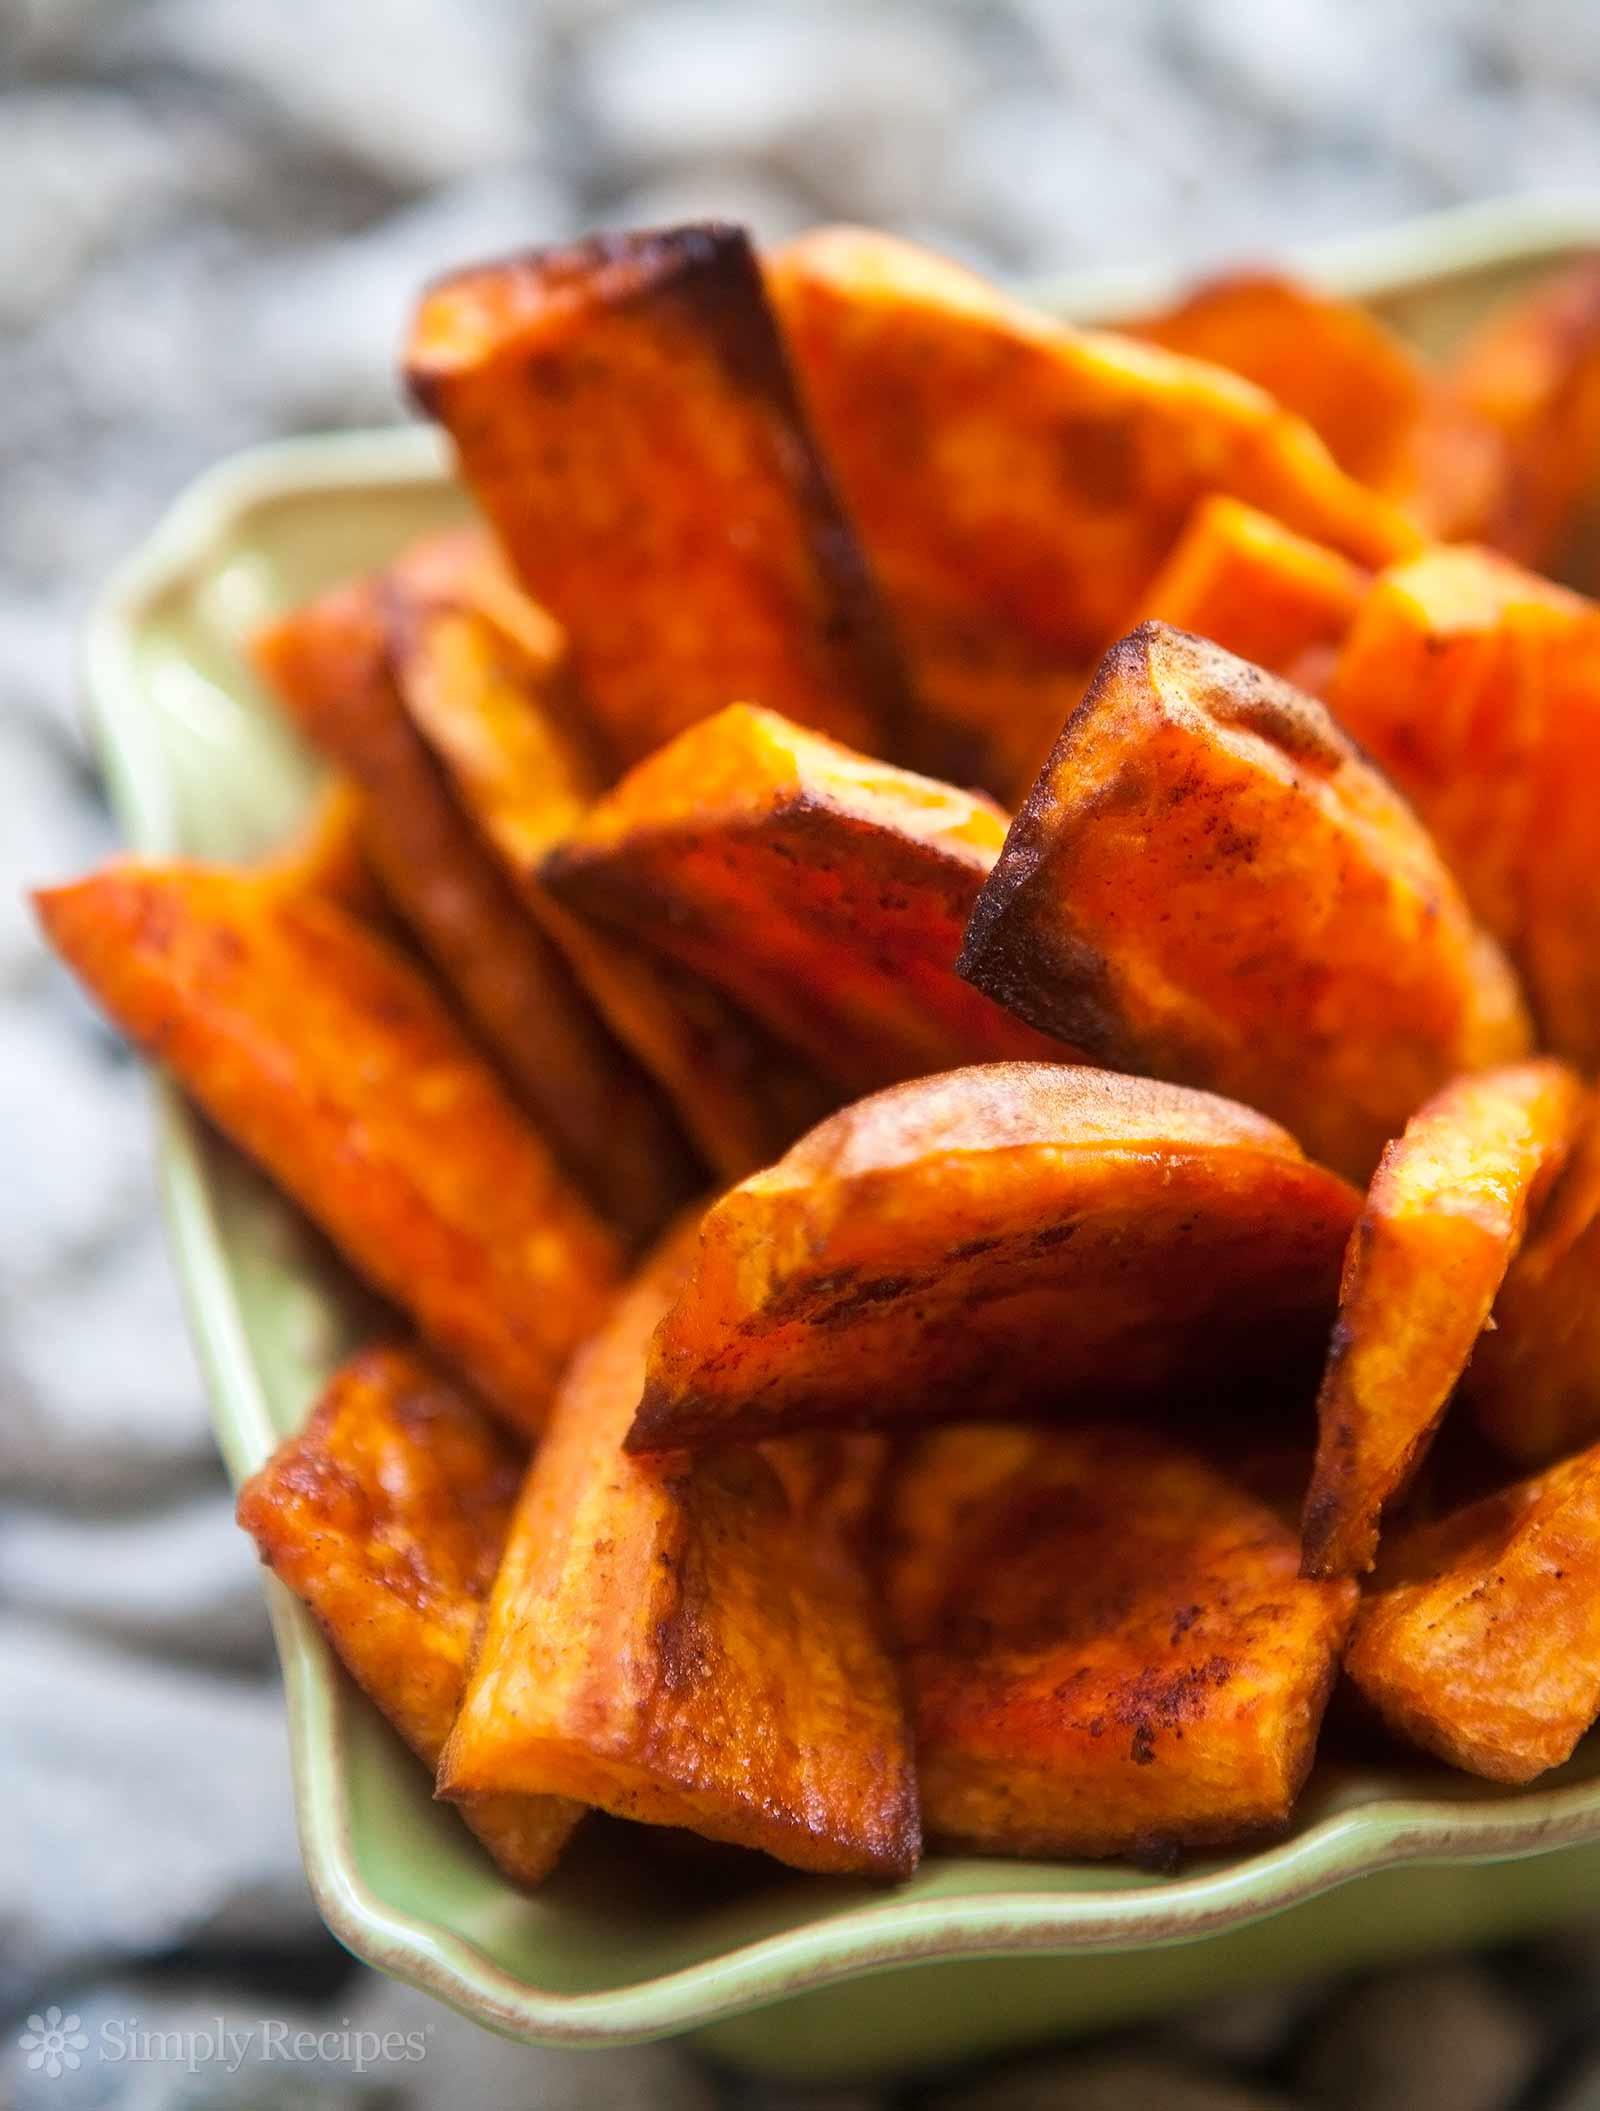 Oven Roasted Sweet Potatoes  Oven Baked Sweet Potato Fries Recipe